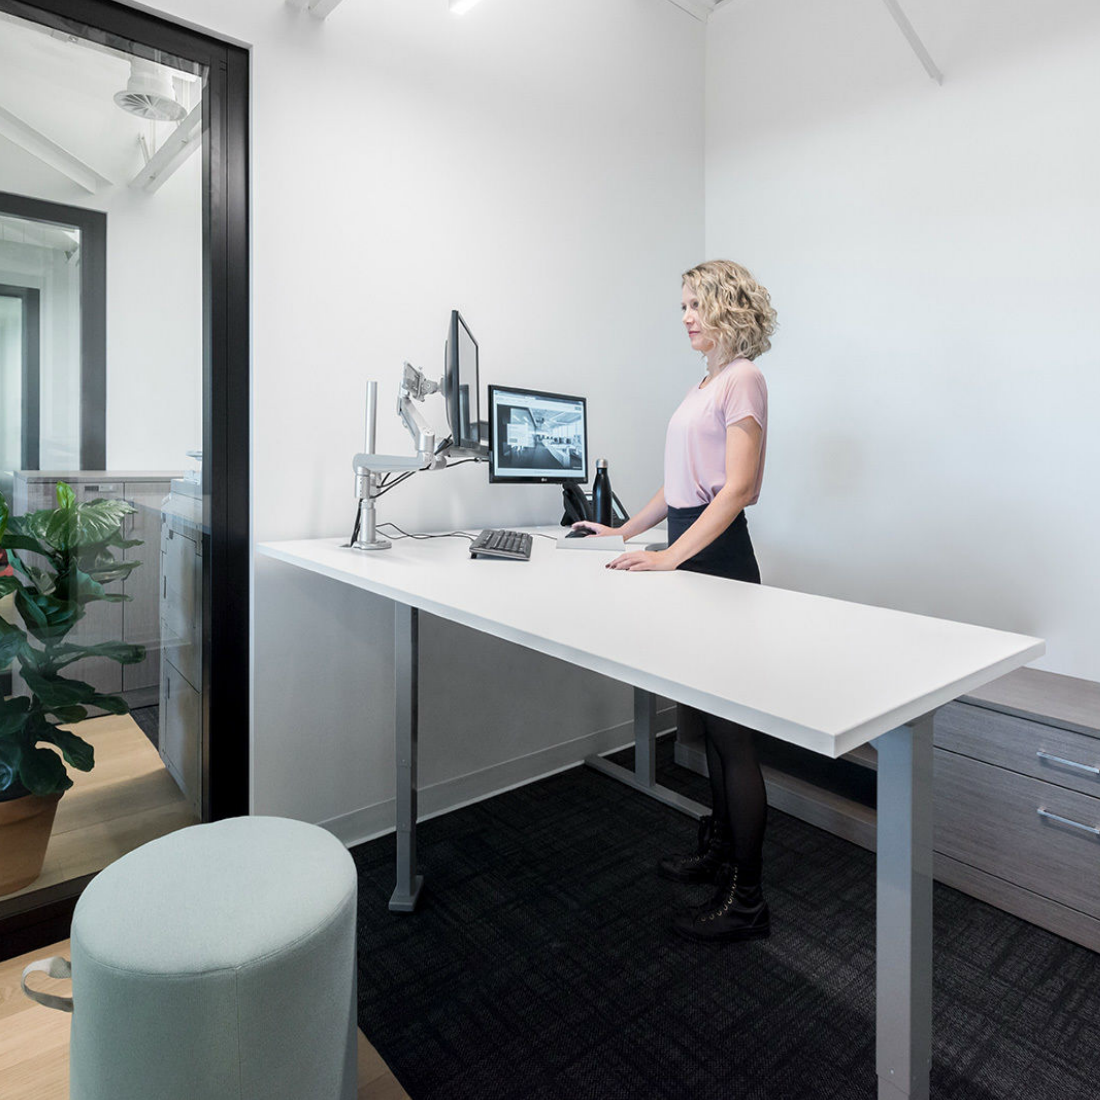 Office Furniture Us: About Us I Creative Office Furniture Winnipeg